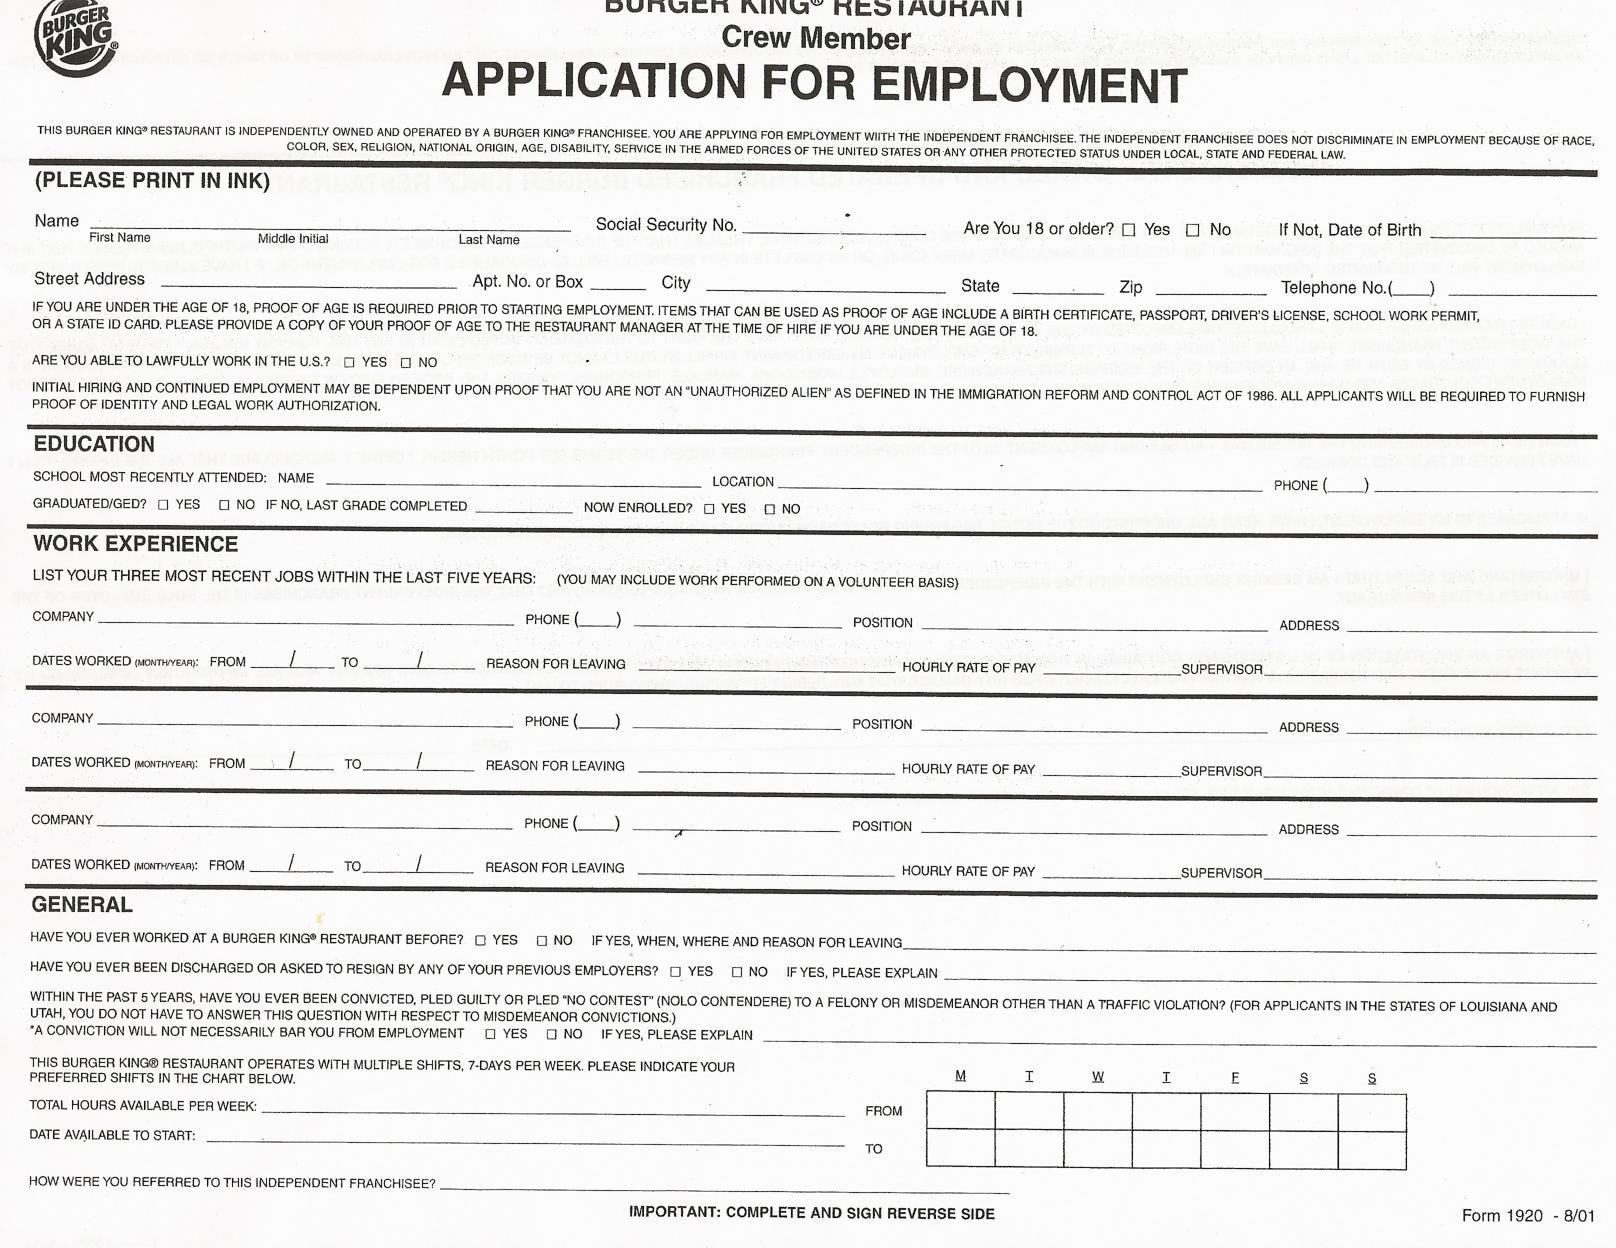 1000+ ideas about Printable Job Applications on Pinterest ...